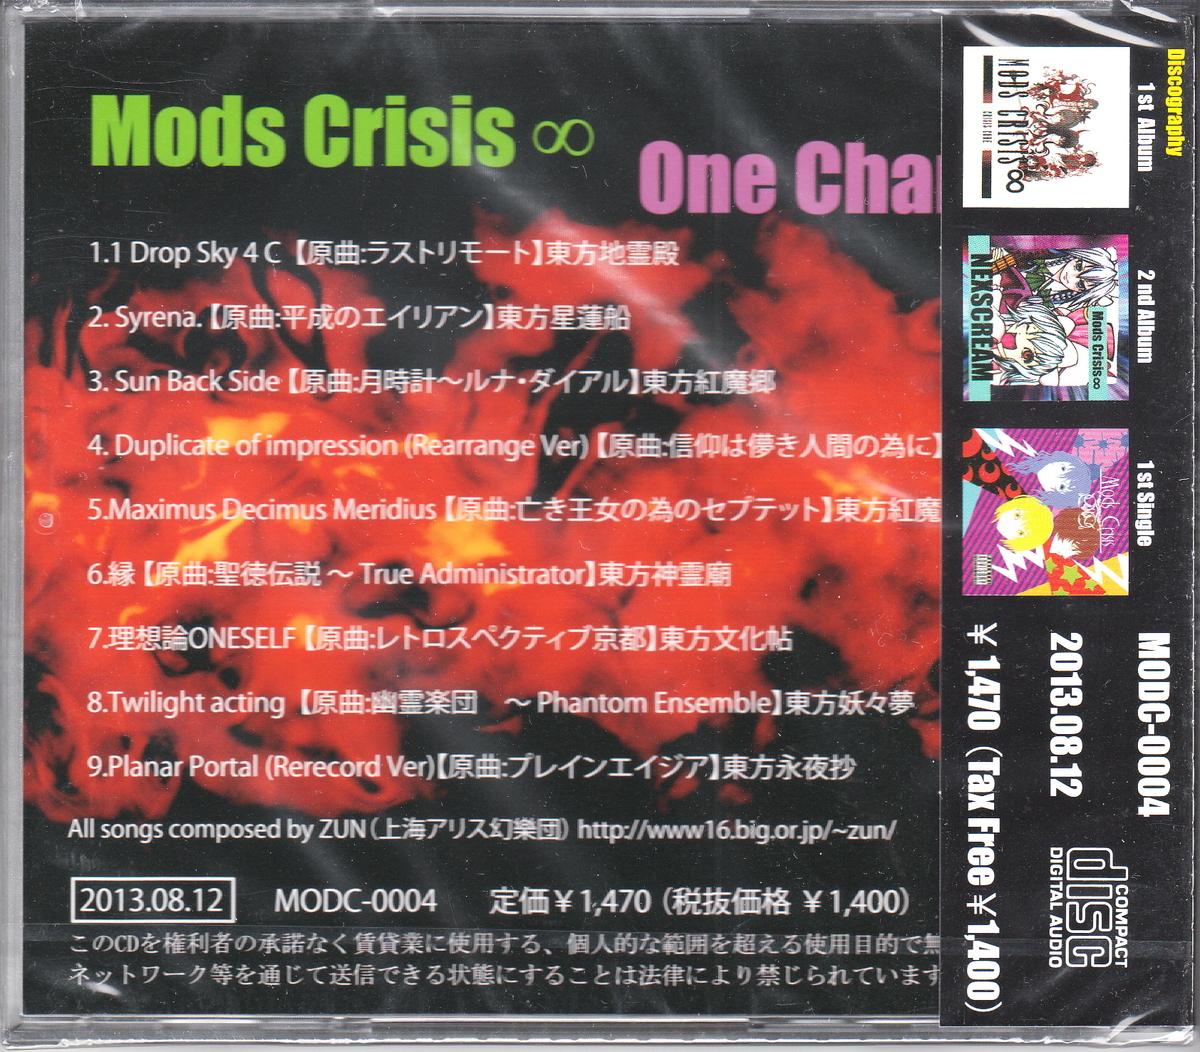 ★Mods Crisis ∞:One chance!!/3rdアルバム,東方アレンジ,ジャパメタ,メタル,メタルコア,スクリーモ,ボーカル,女性Vo,同人音楽,未開封_画像2